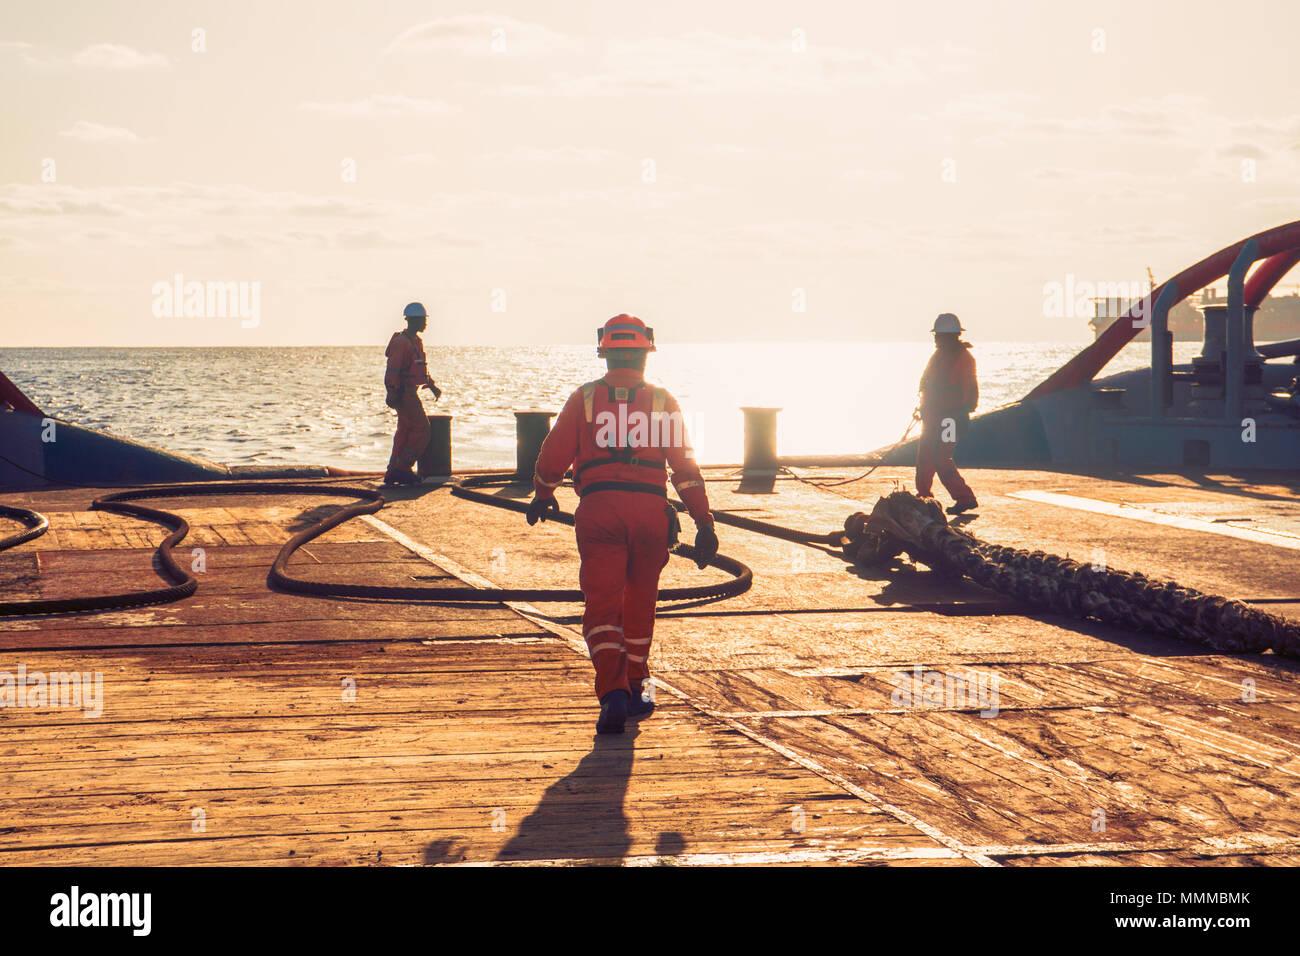 Anchor-handling Tug Supply AHTS vessel crew preparing vessel for